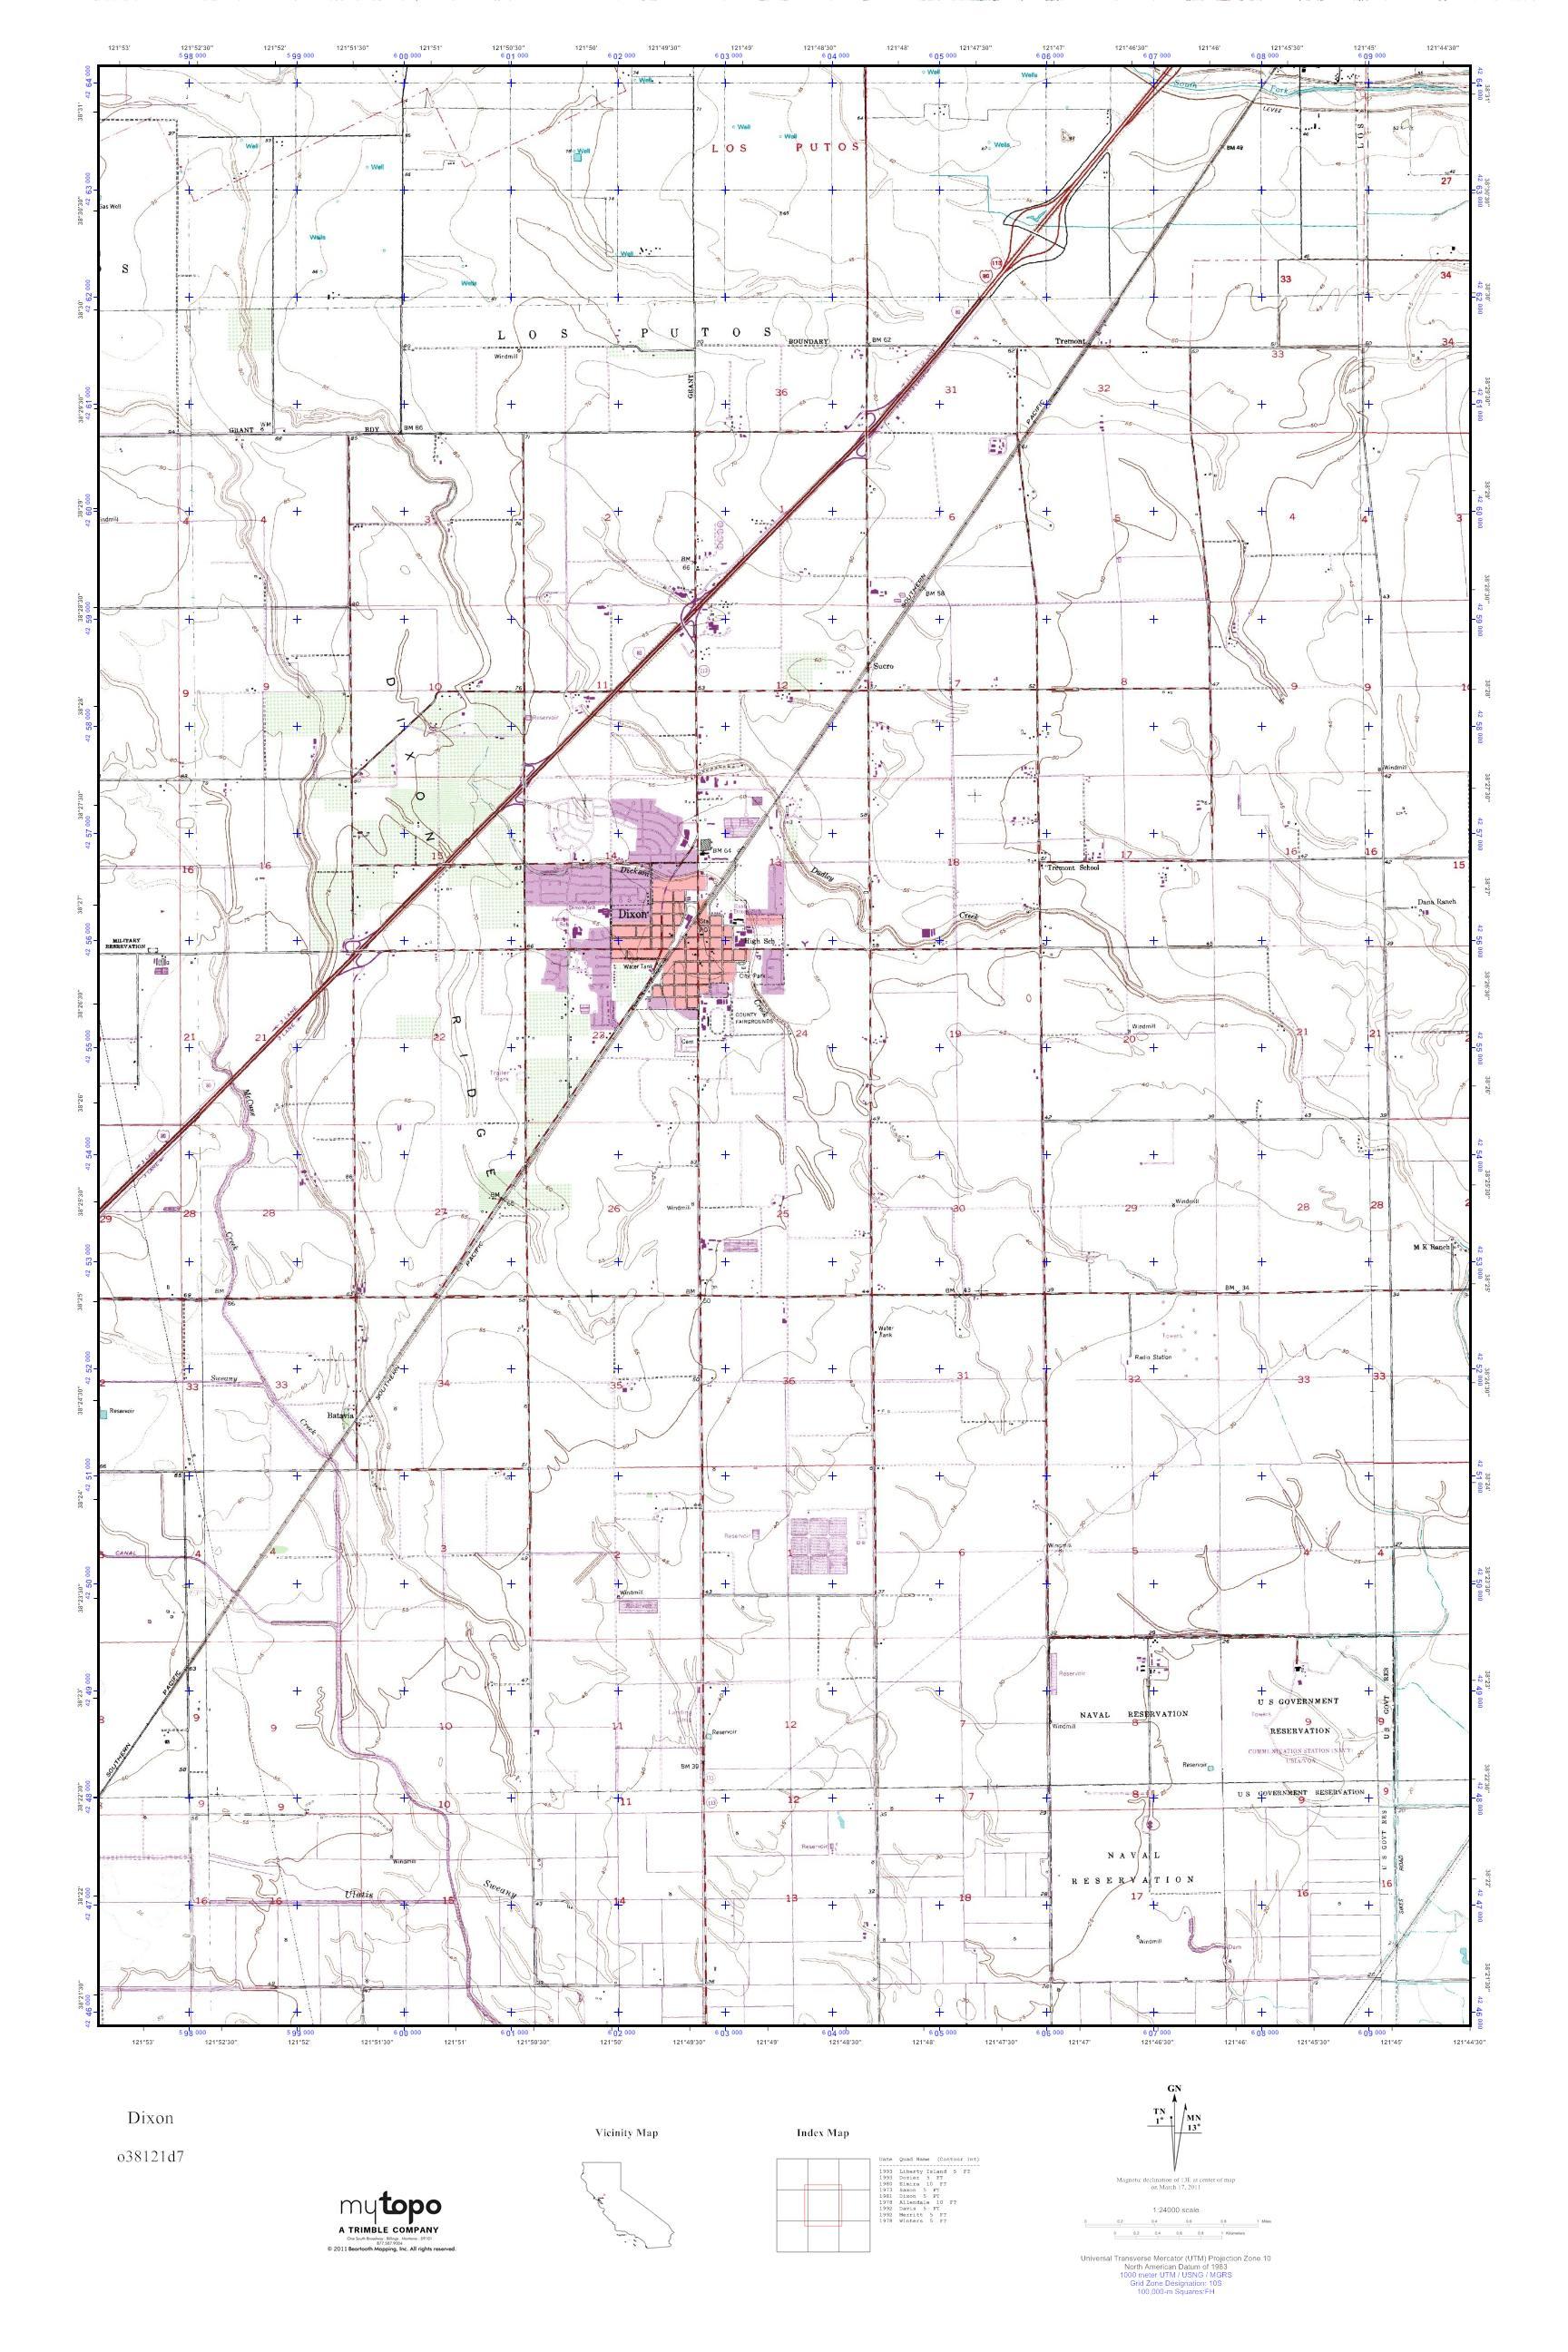 MyTopo Dixon, California USGS Quad Topo Map